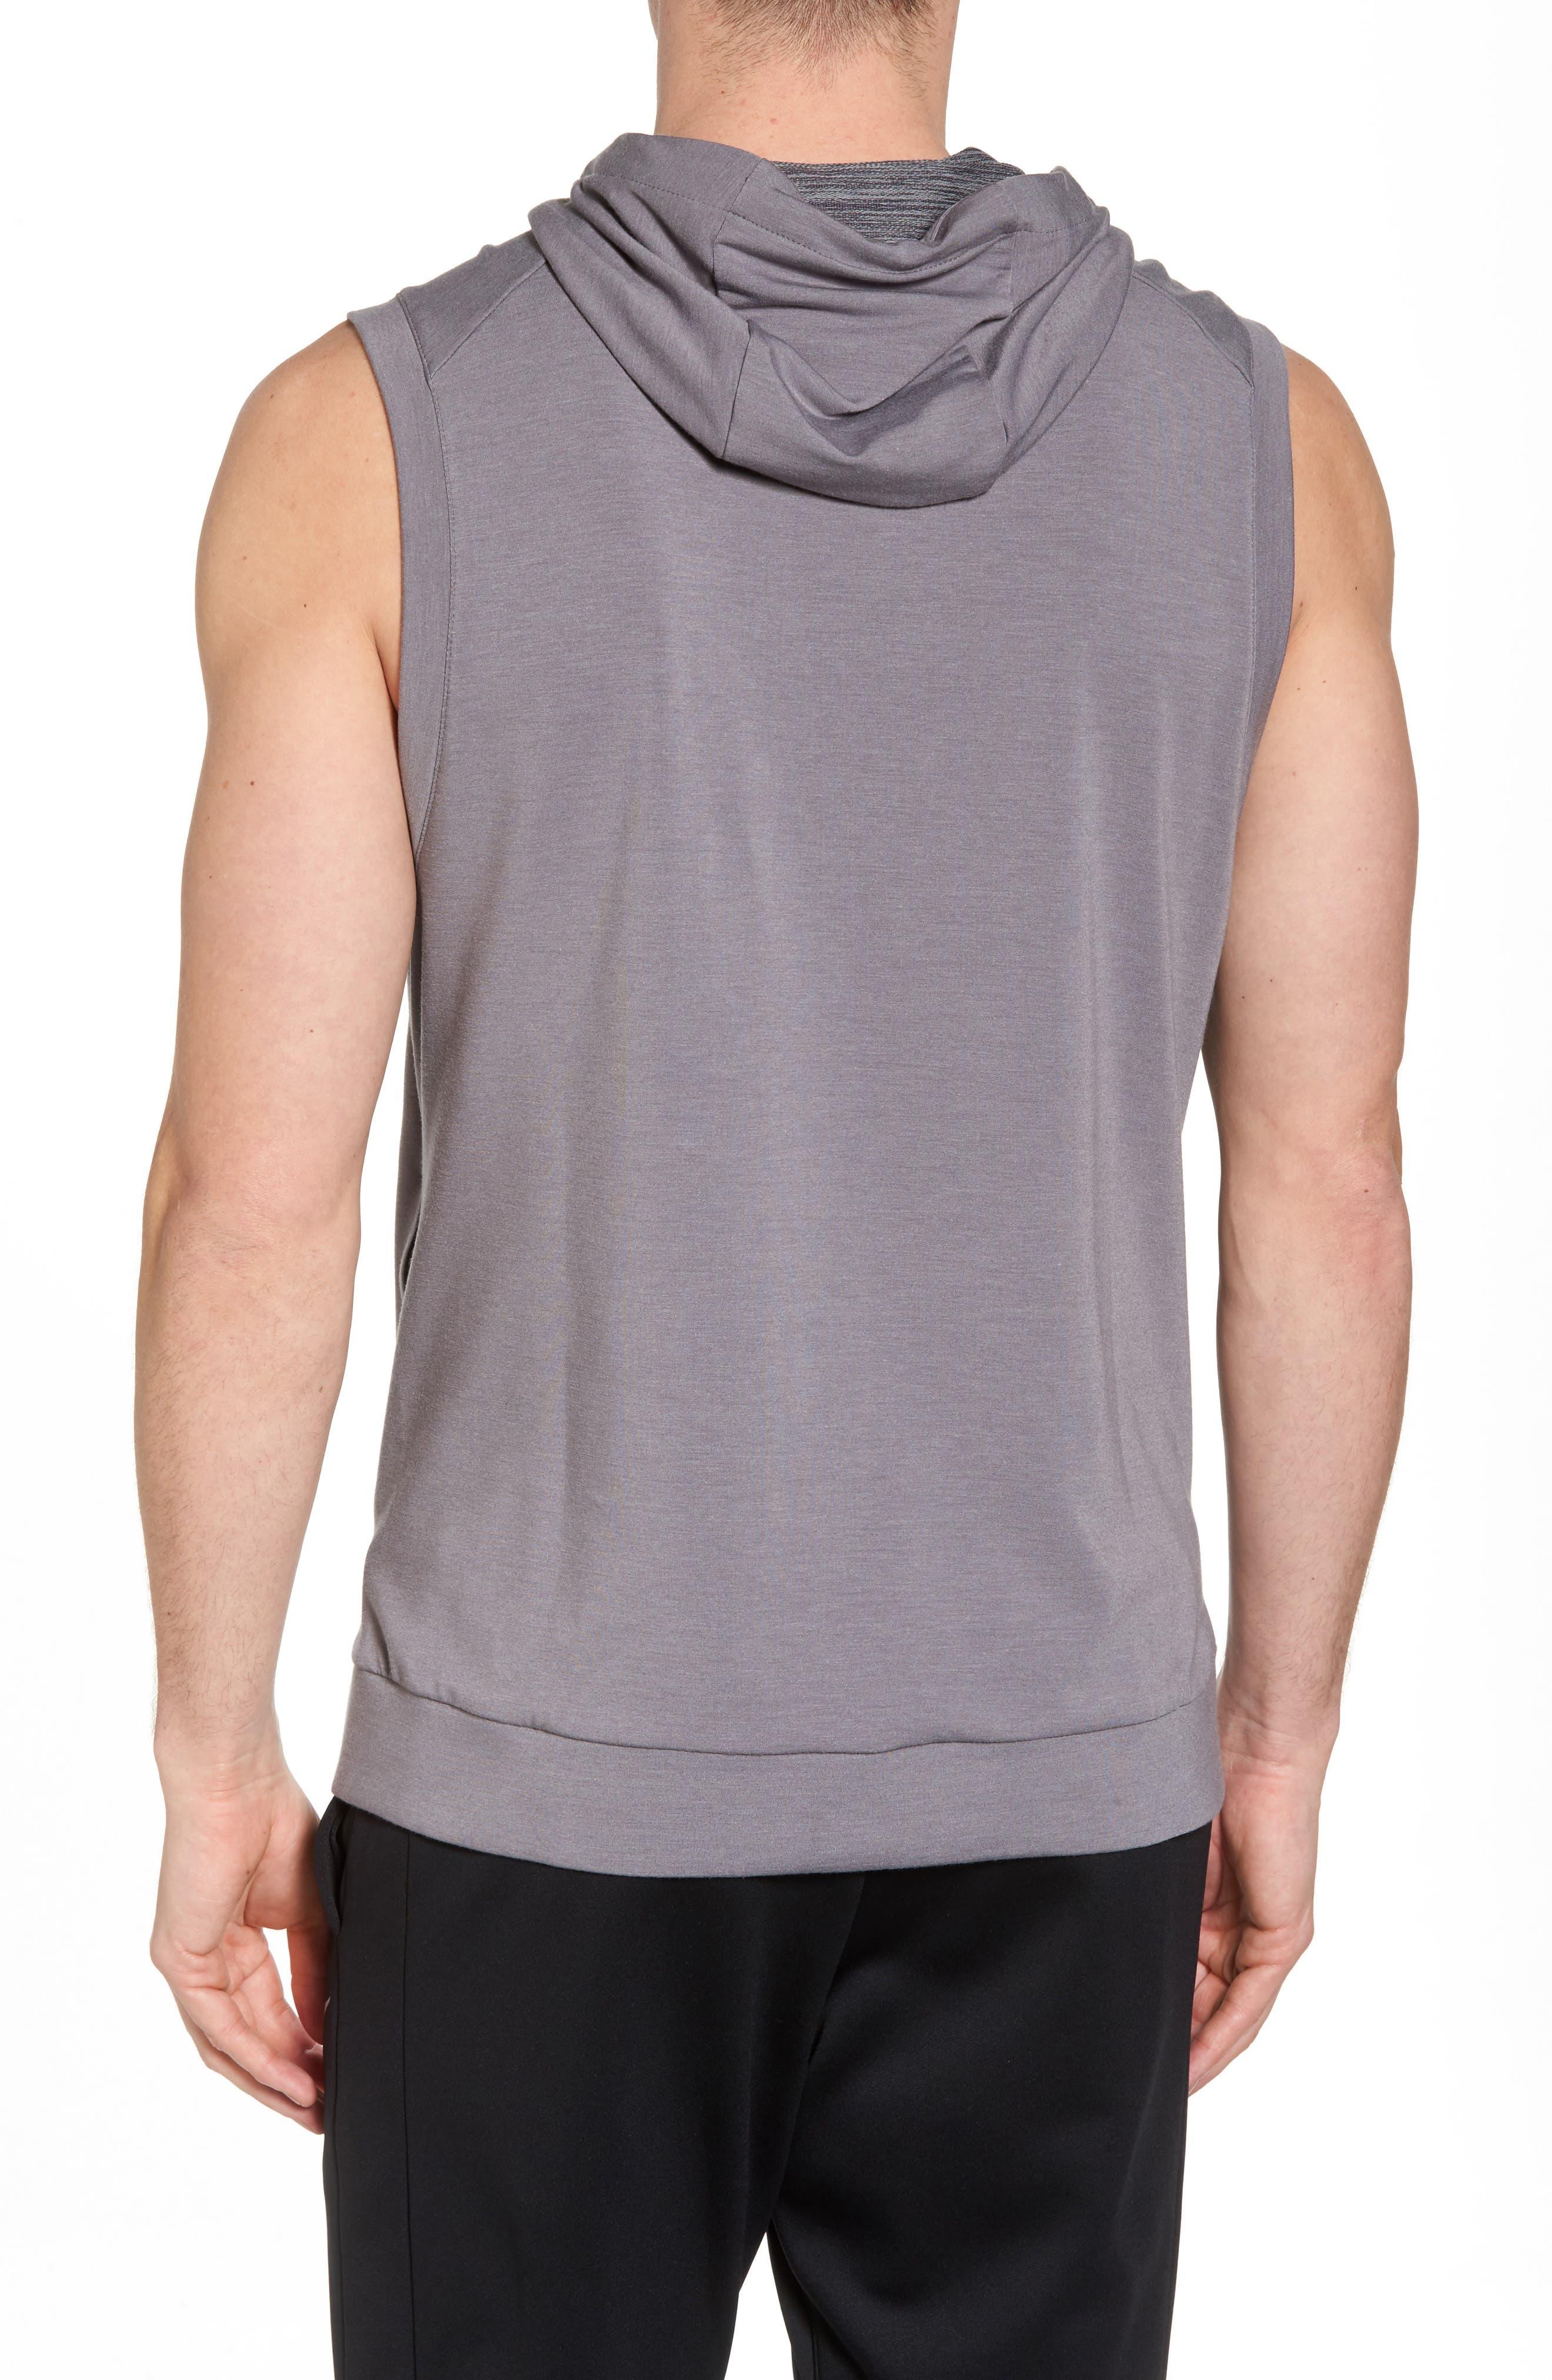 Alternate Image 2  - Nike Dry Training Day Sleeveless Hoodie